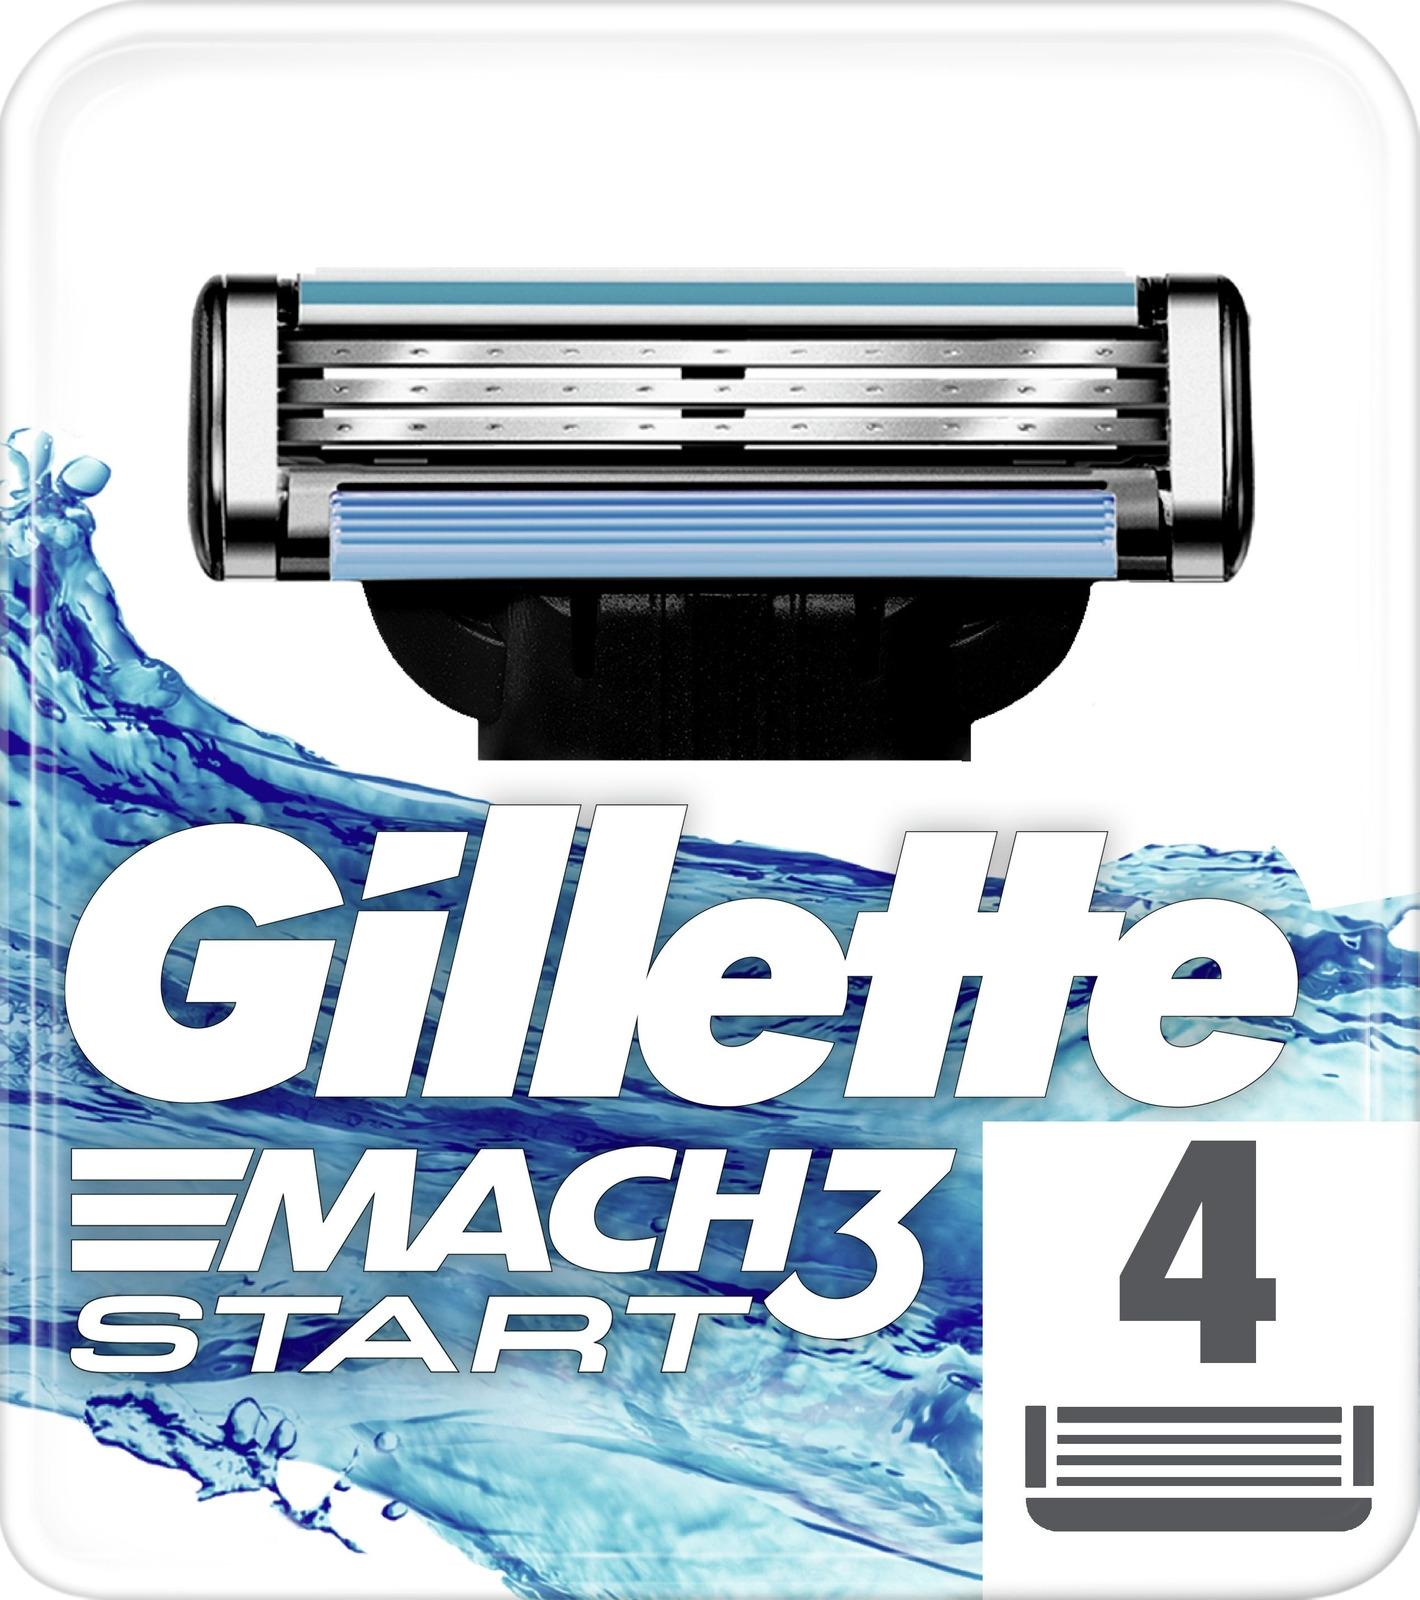 Gillette Mach3 Start Сменные Кассеты Для Бритвы, 4 шт